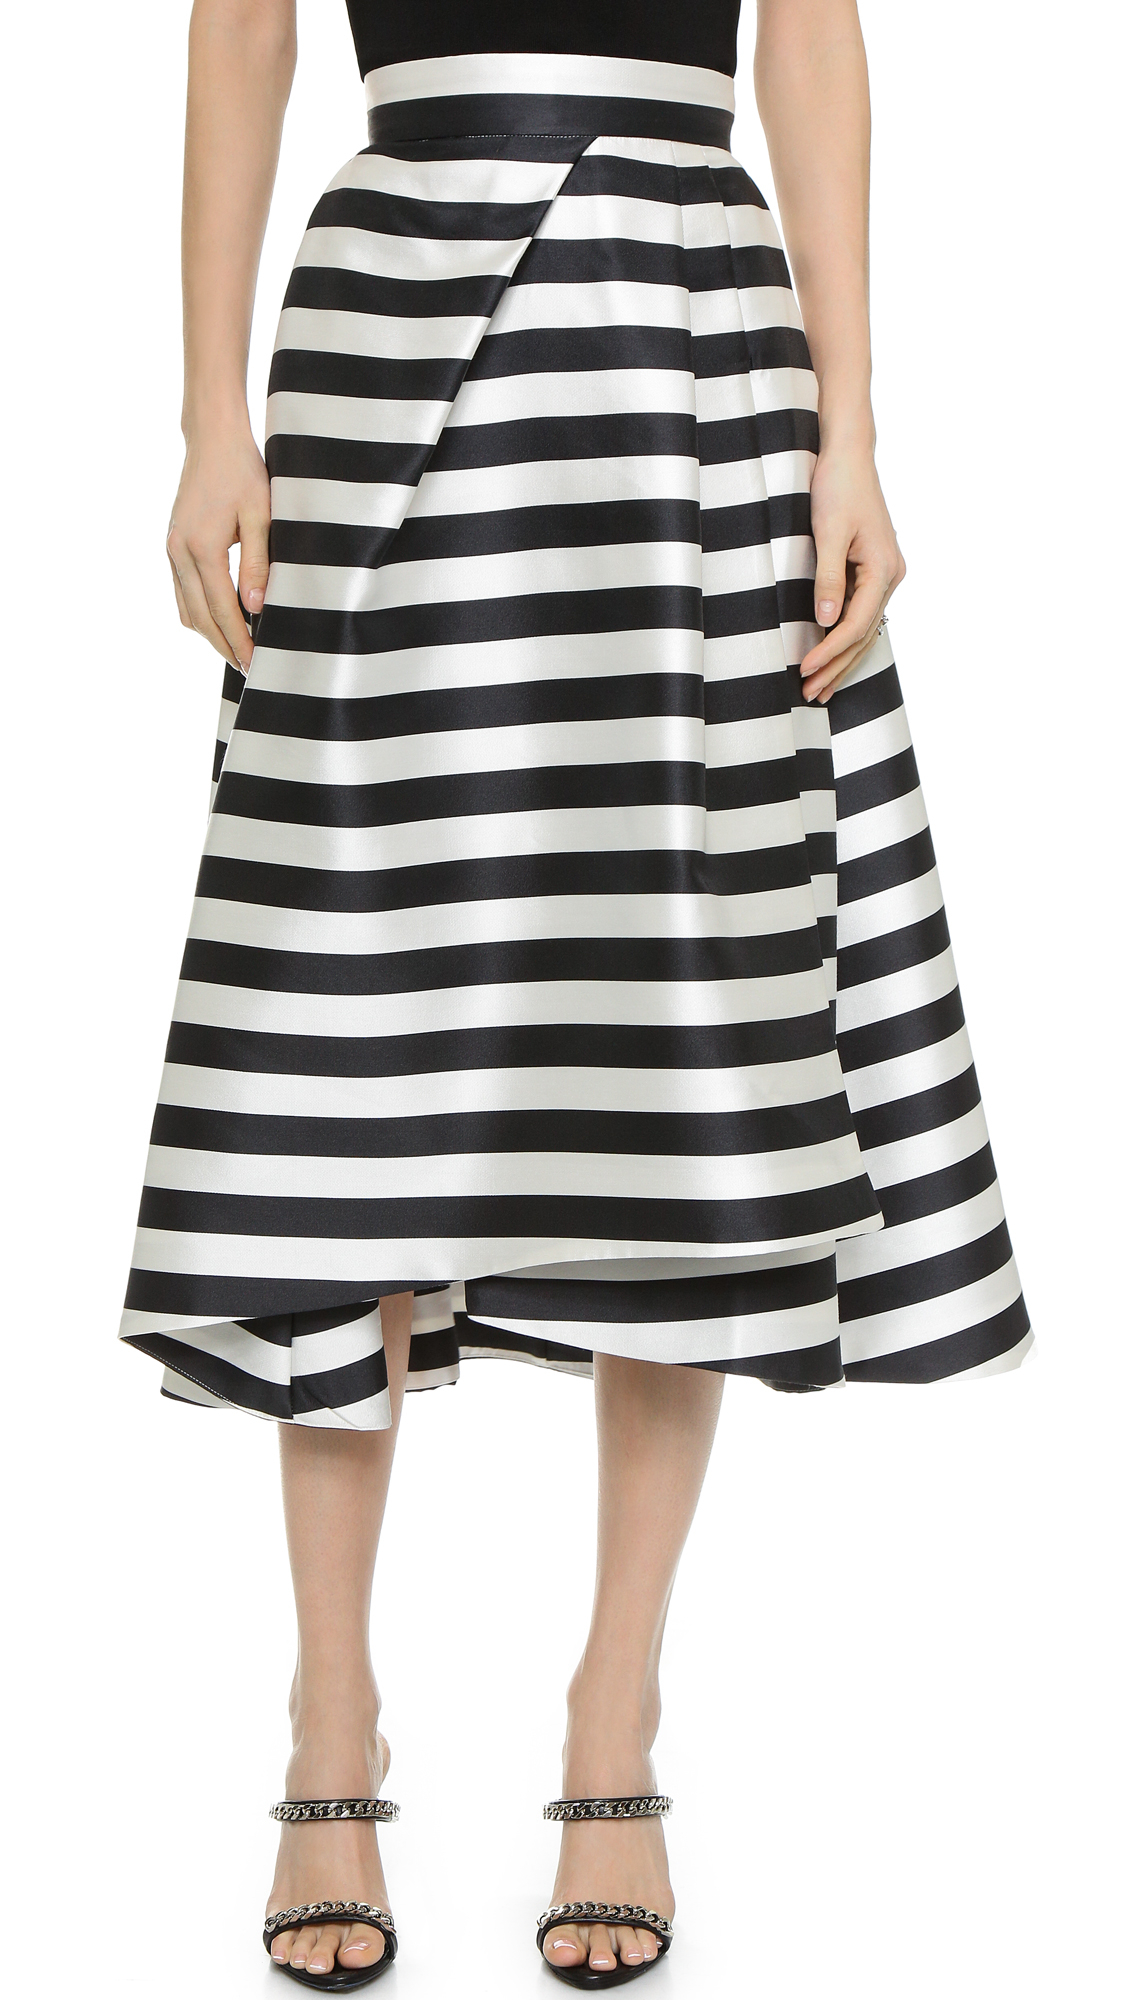 nicholas thin stripe pleat skirt black white in